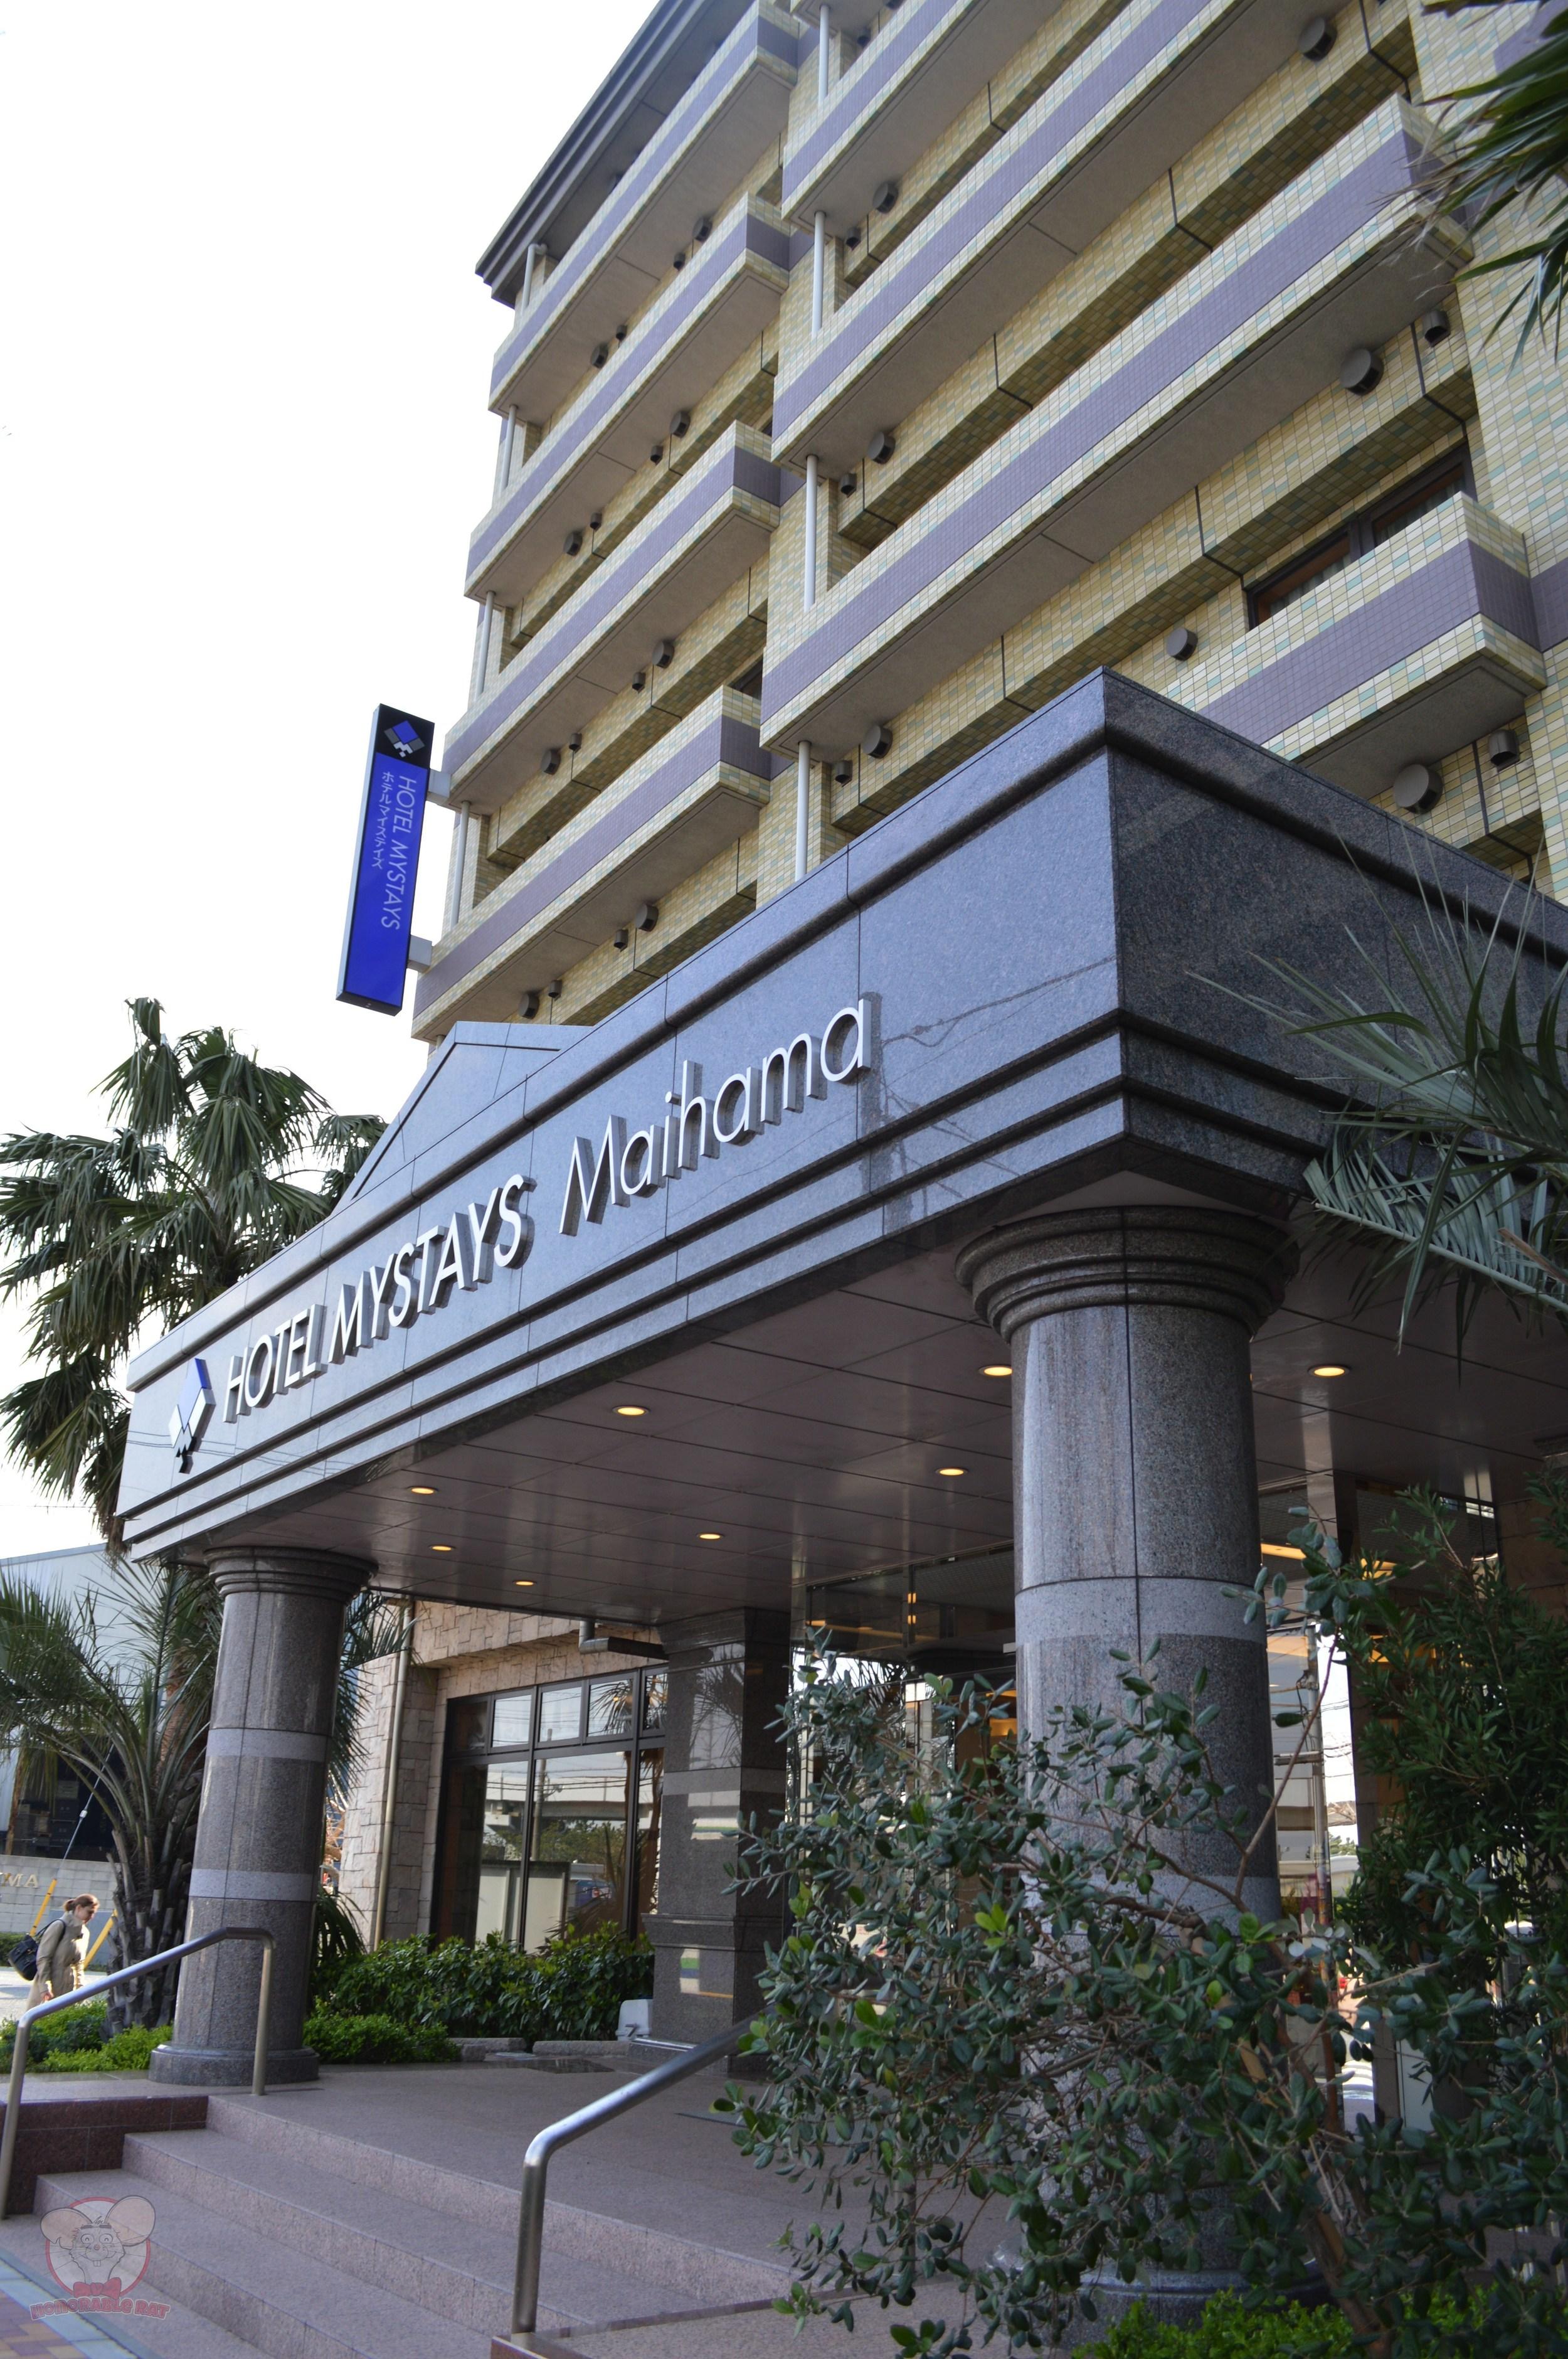 Hotel Mystays Maihama